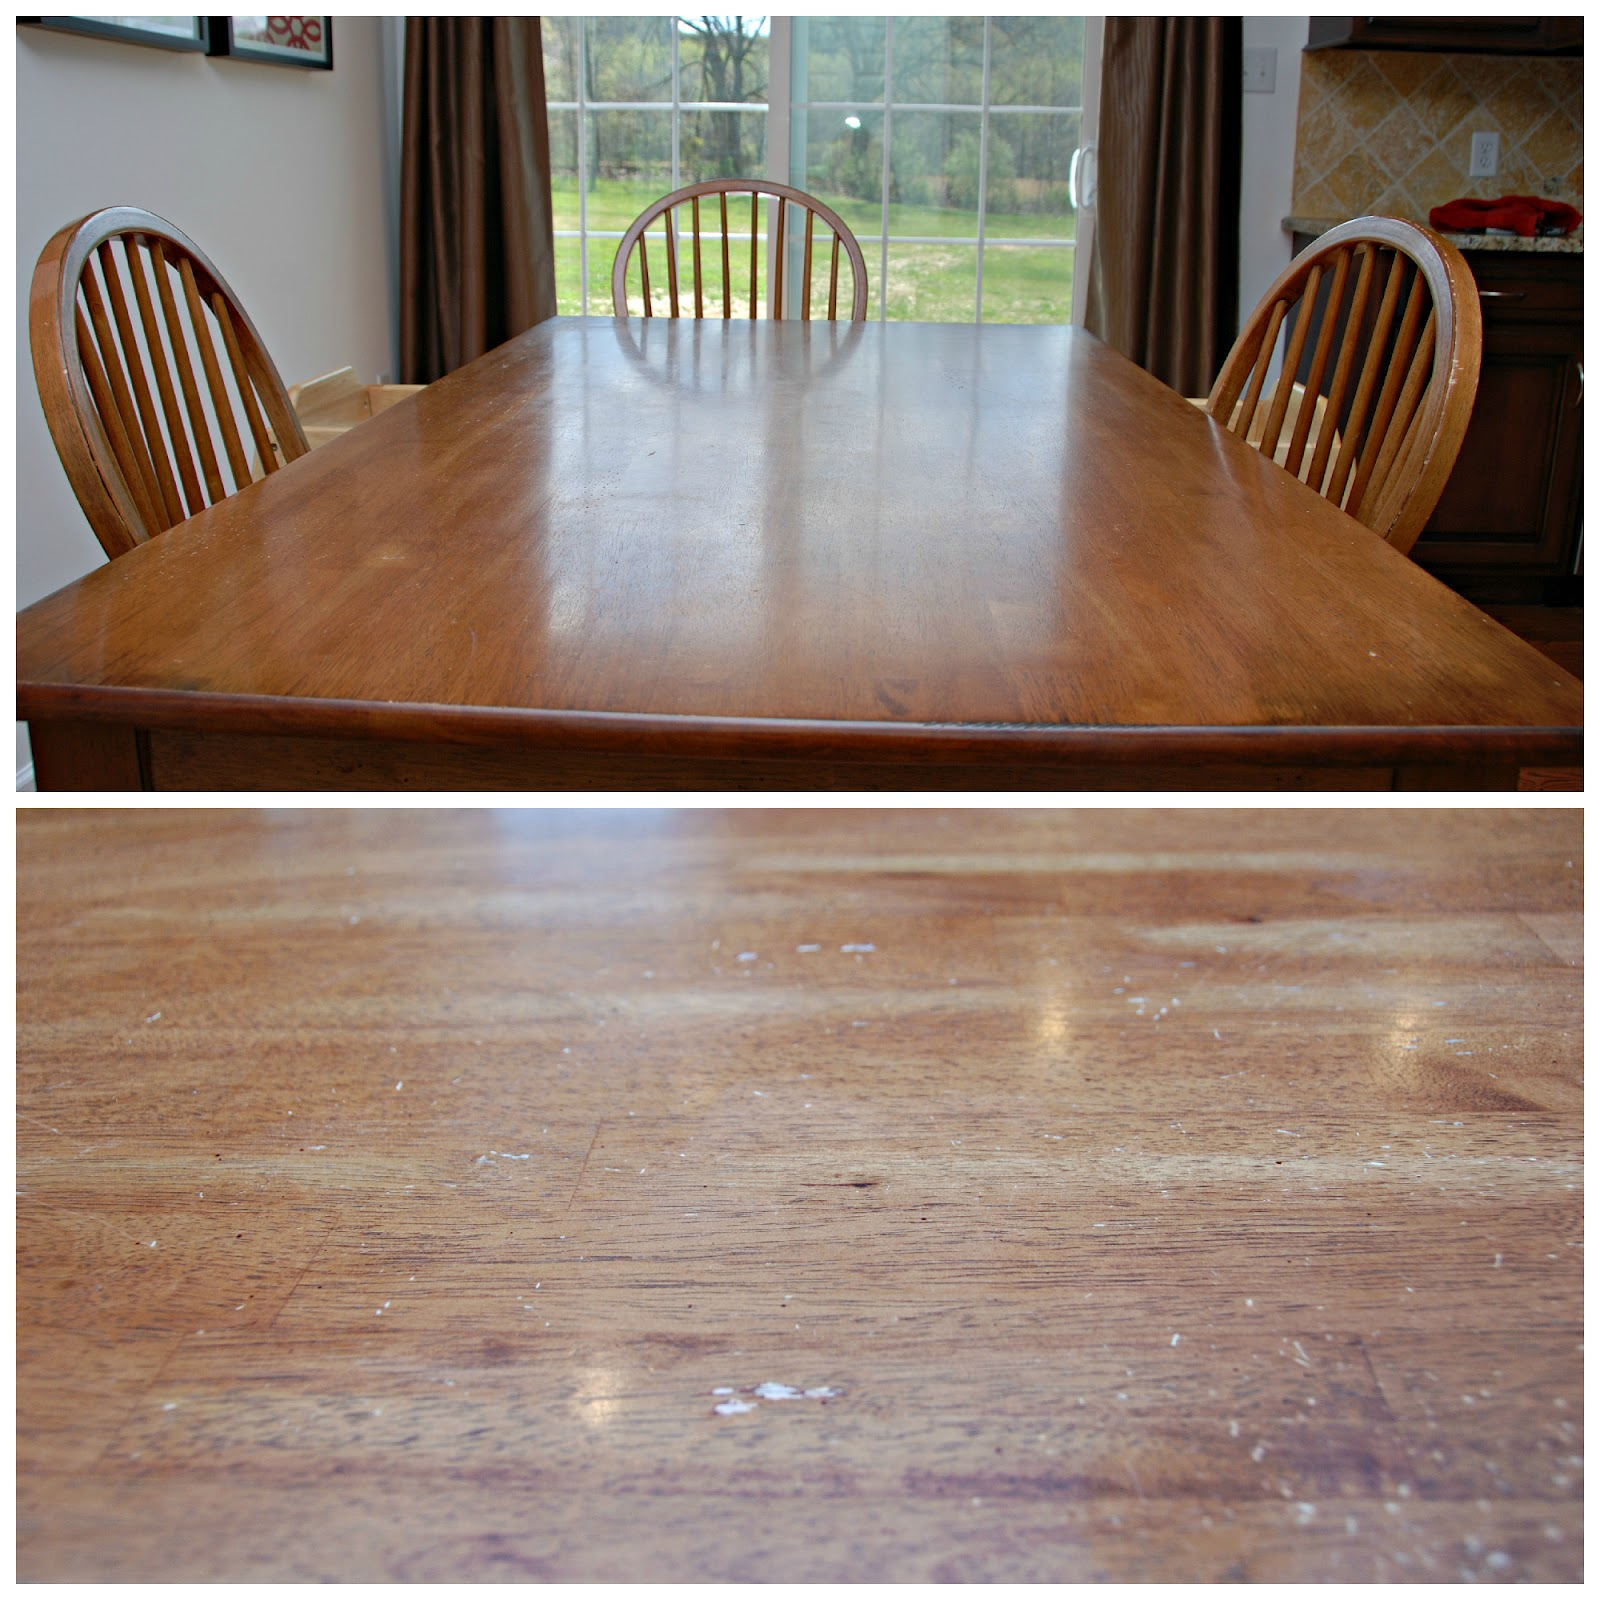 refinished kitchen table refinish kitchen table Refinished Kitchen Table